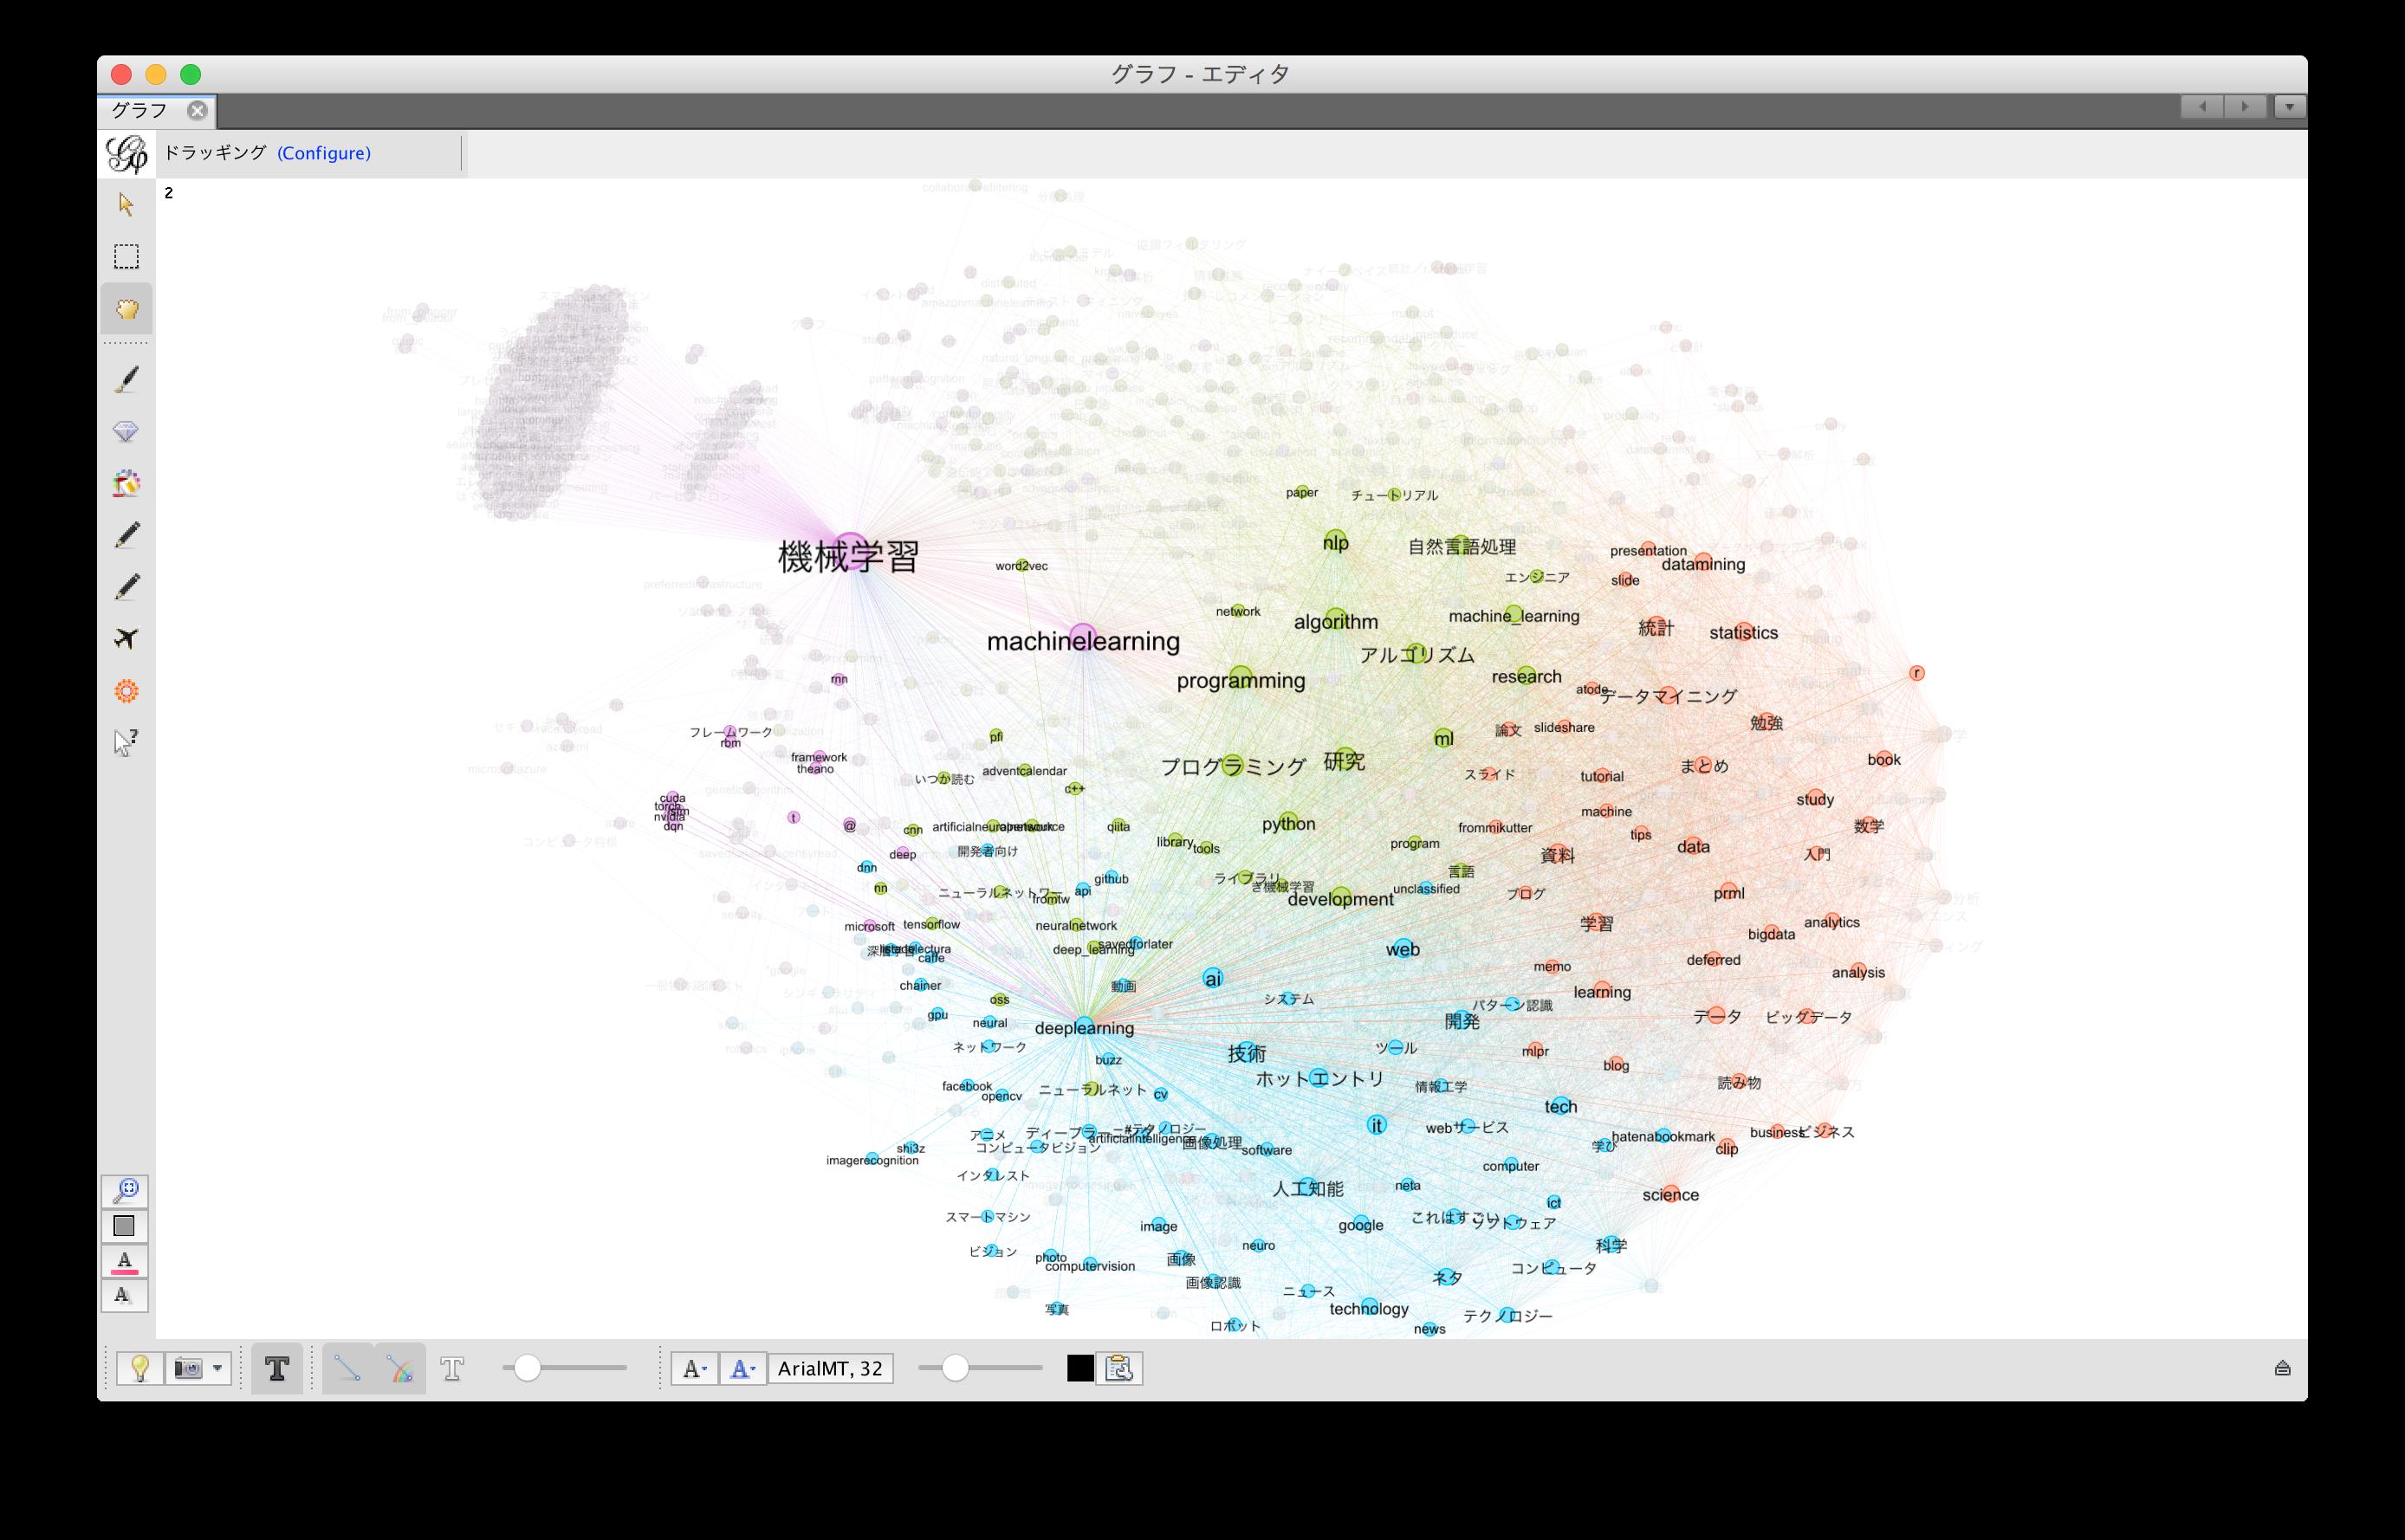 「deep learning」タグ周りの共起タグ